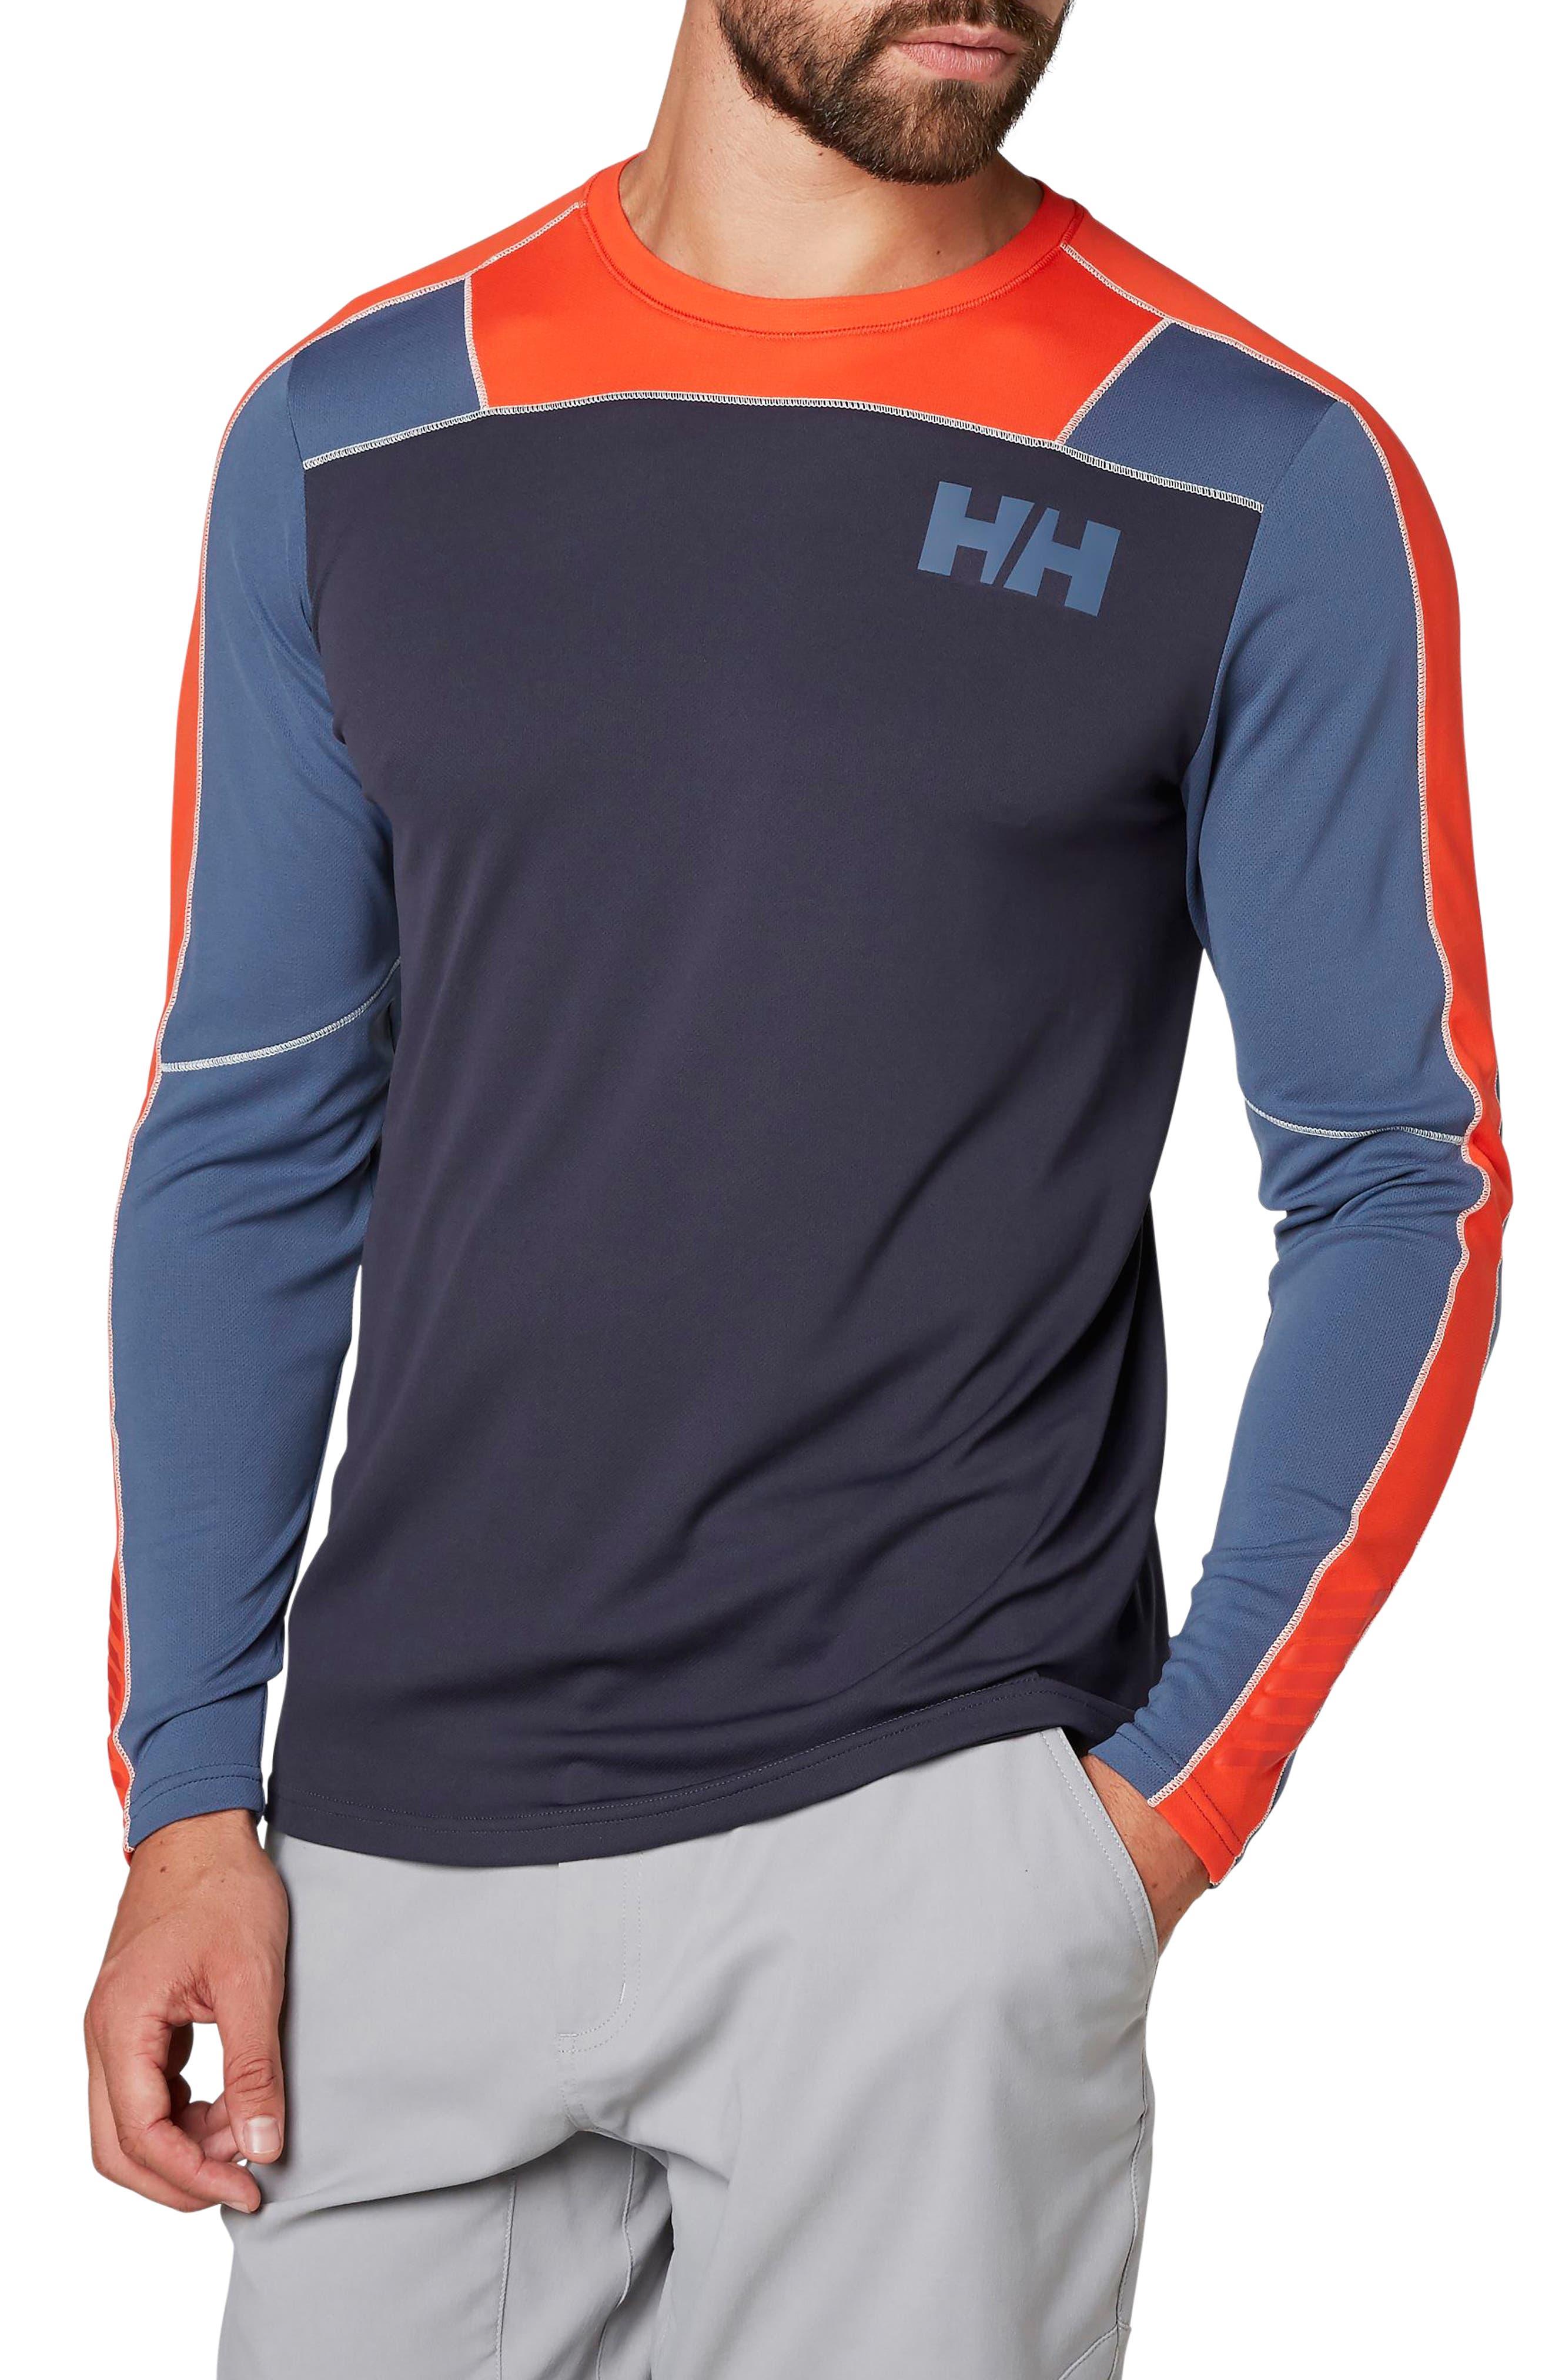 HH<sup>®</sup> Lifa Active Light Long Sleeve T-Shirt,                         Main,                         color, Graphite Blue